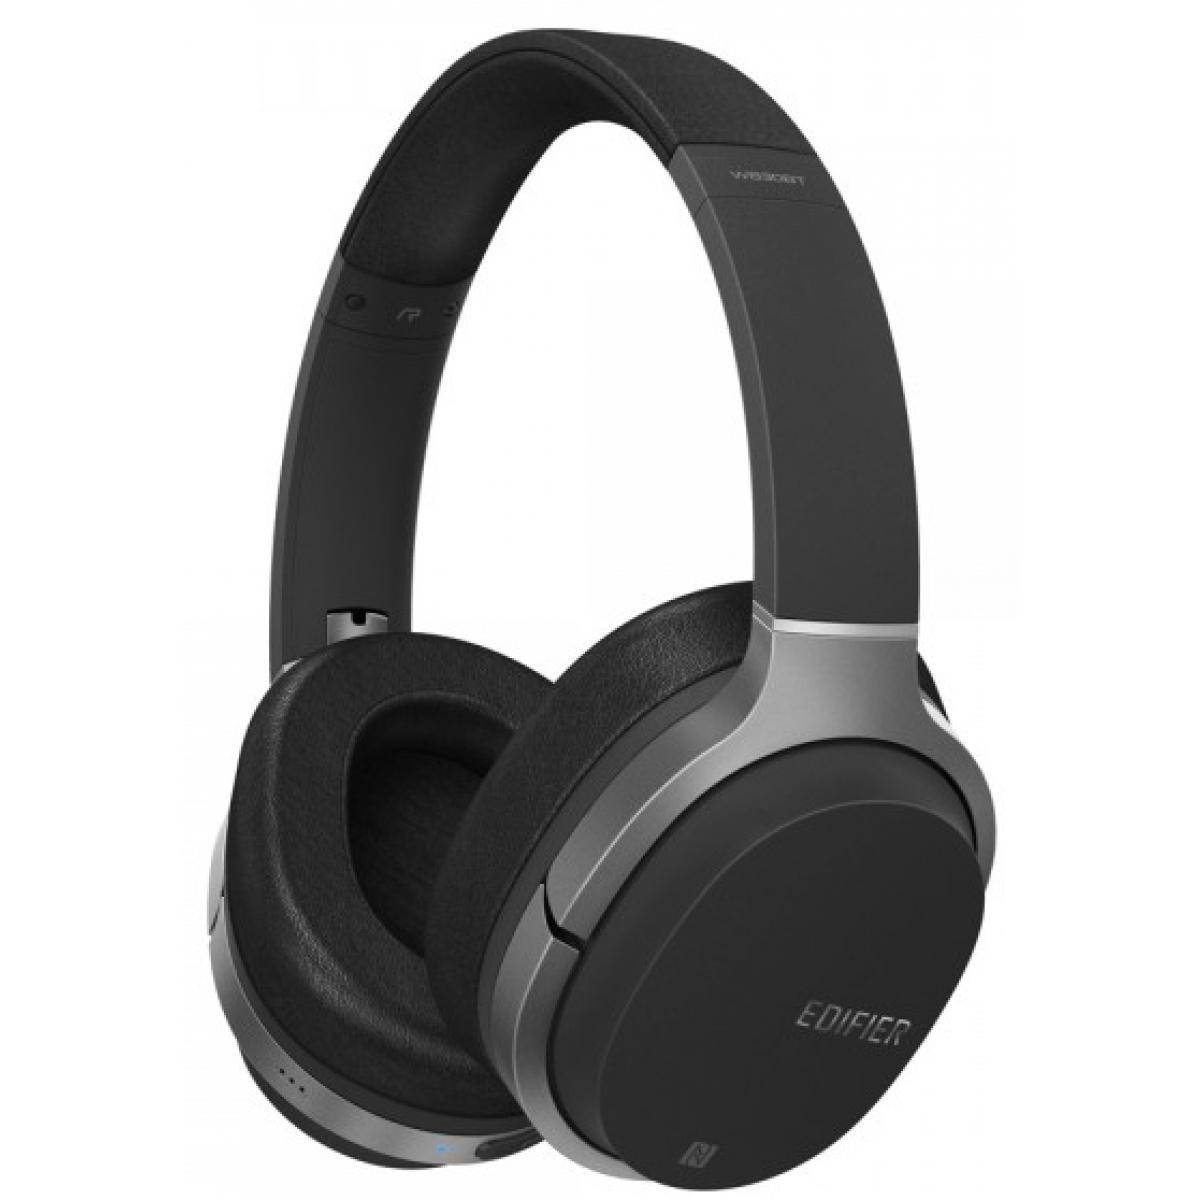 Headset Gamer Edifier W830BT, Bluetooth, Black